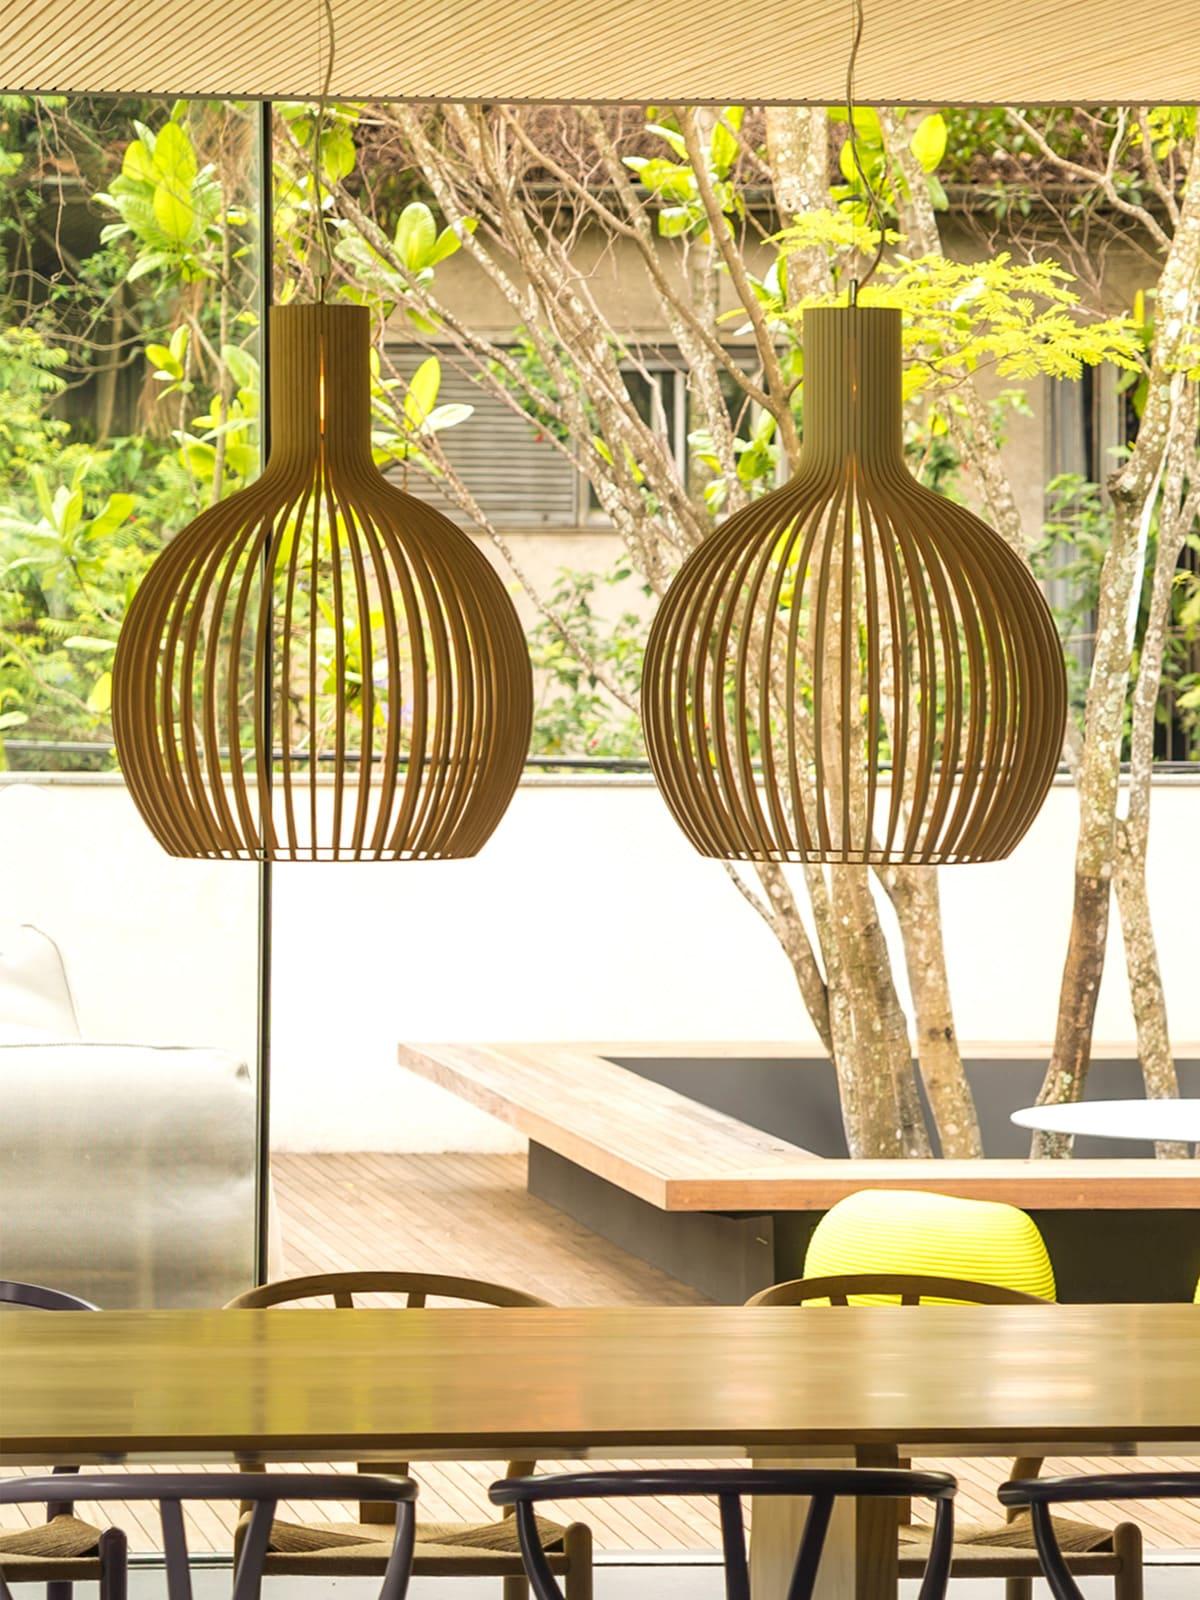 Secto Design Octo 4240 Holzleuchte nachhaltig Designort